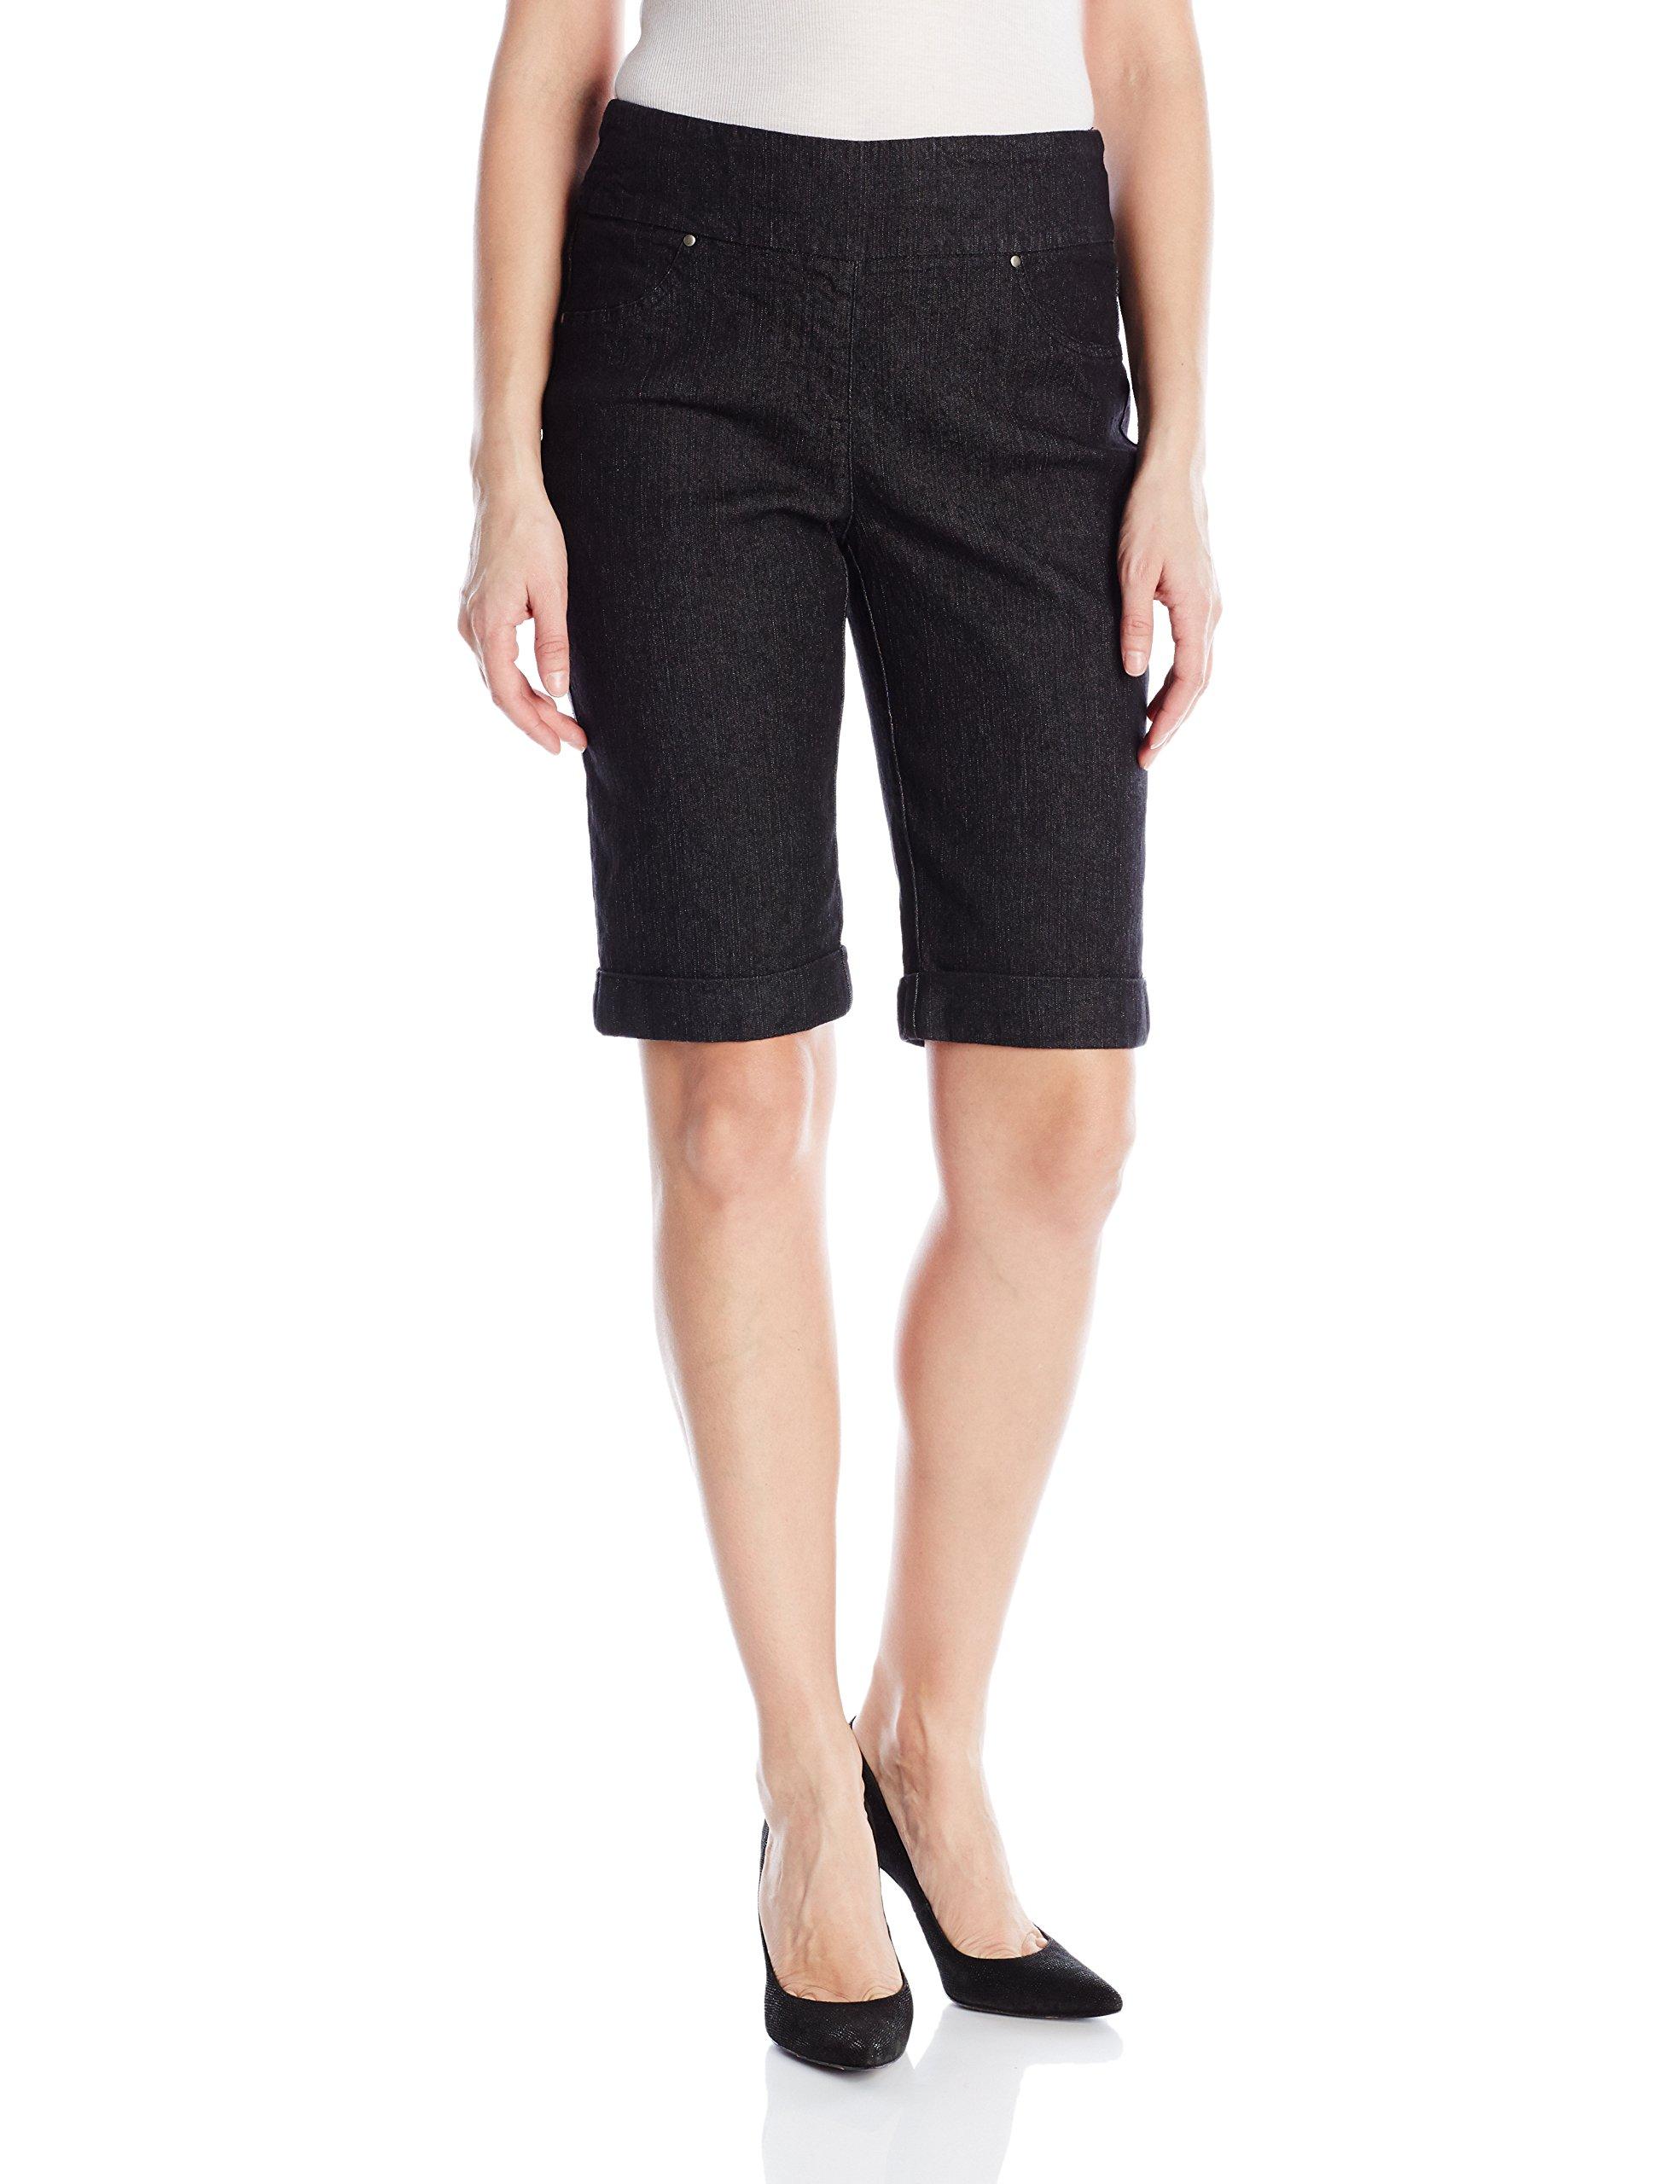 Ruby Rd. Women's Petite Pull-on Extra Stretch Cuffed Denim Short, Black, 16P